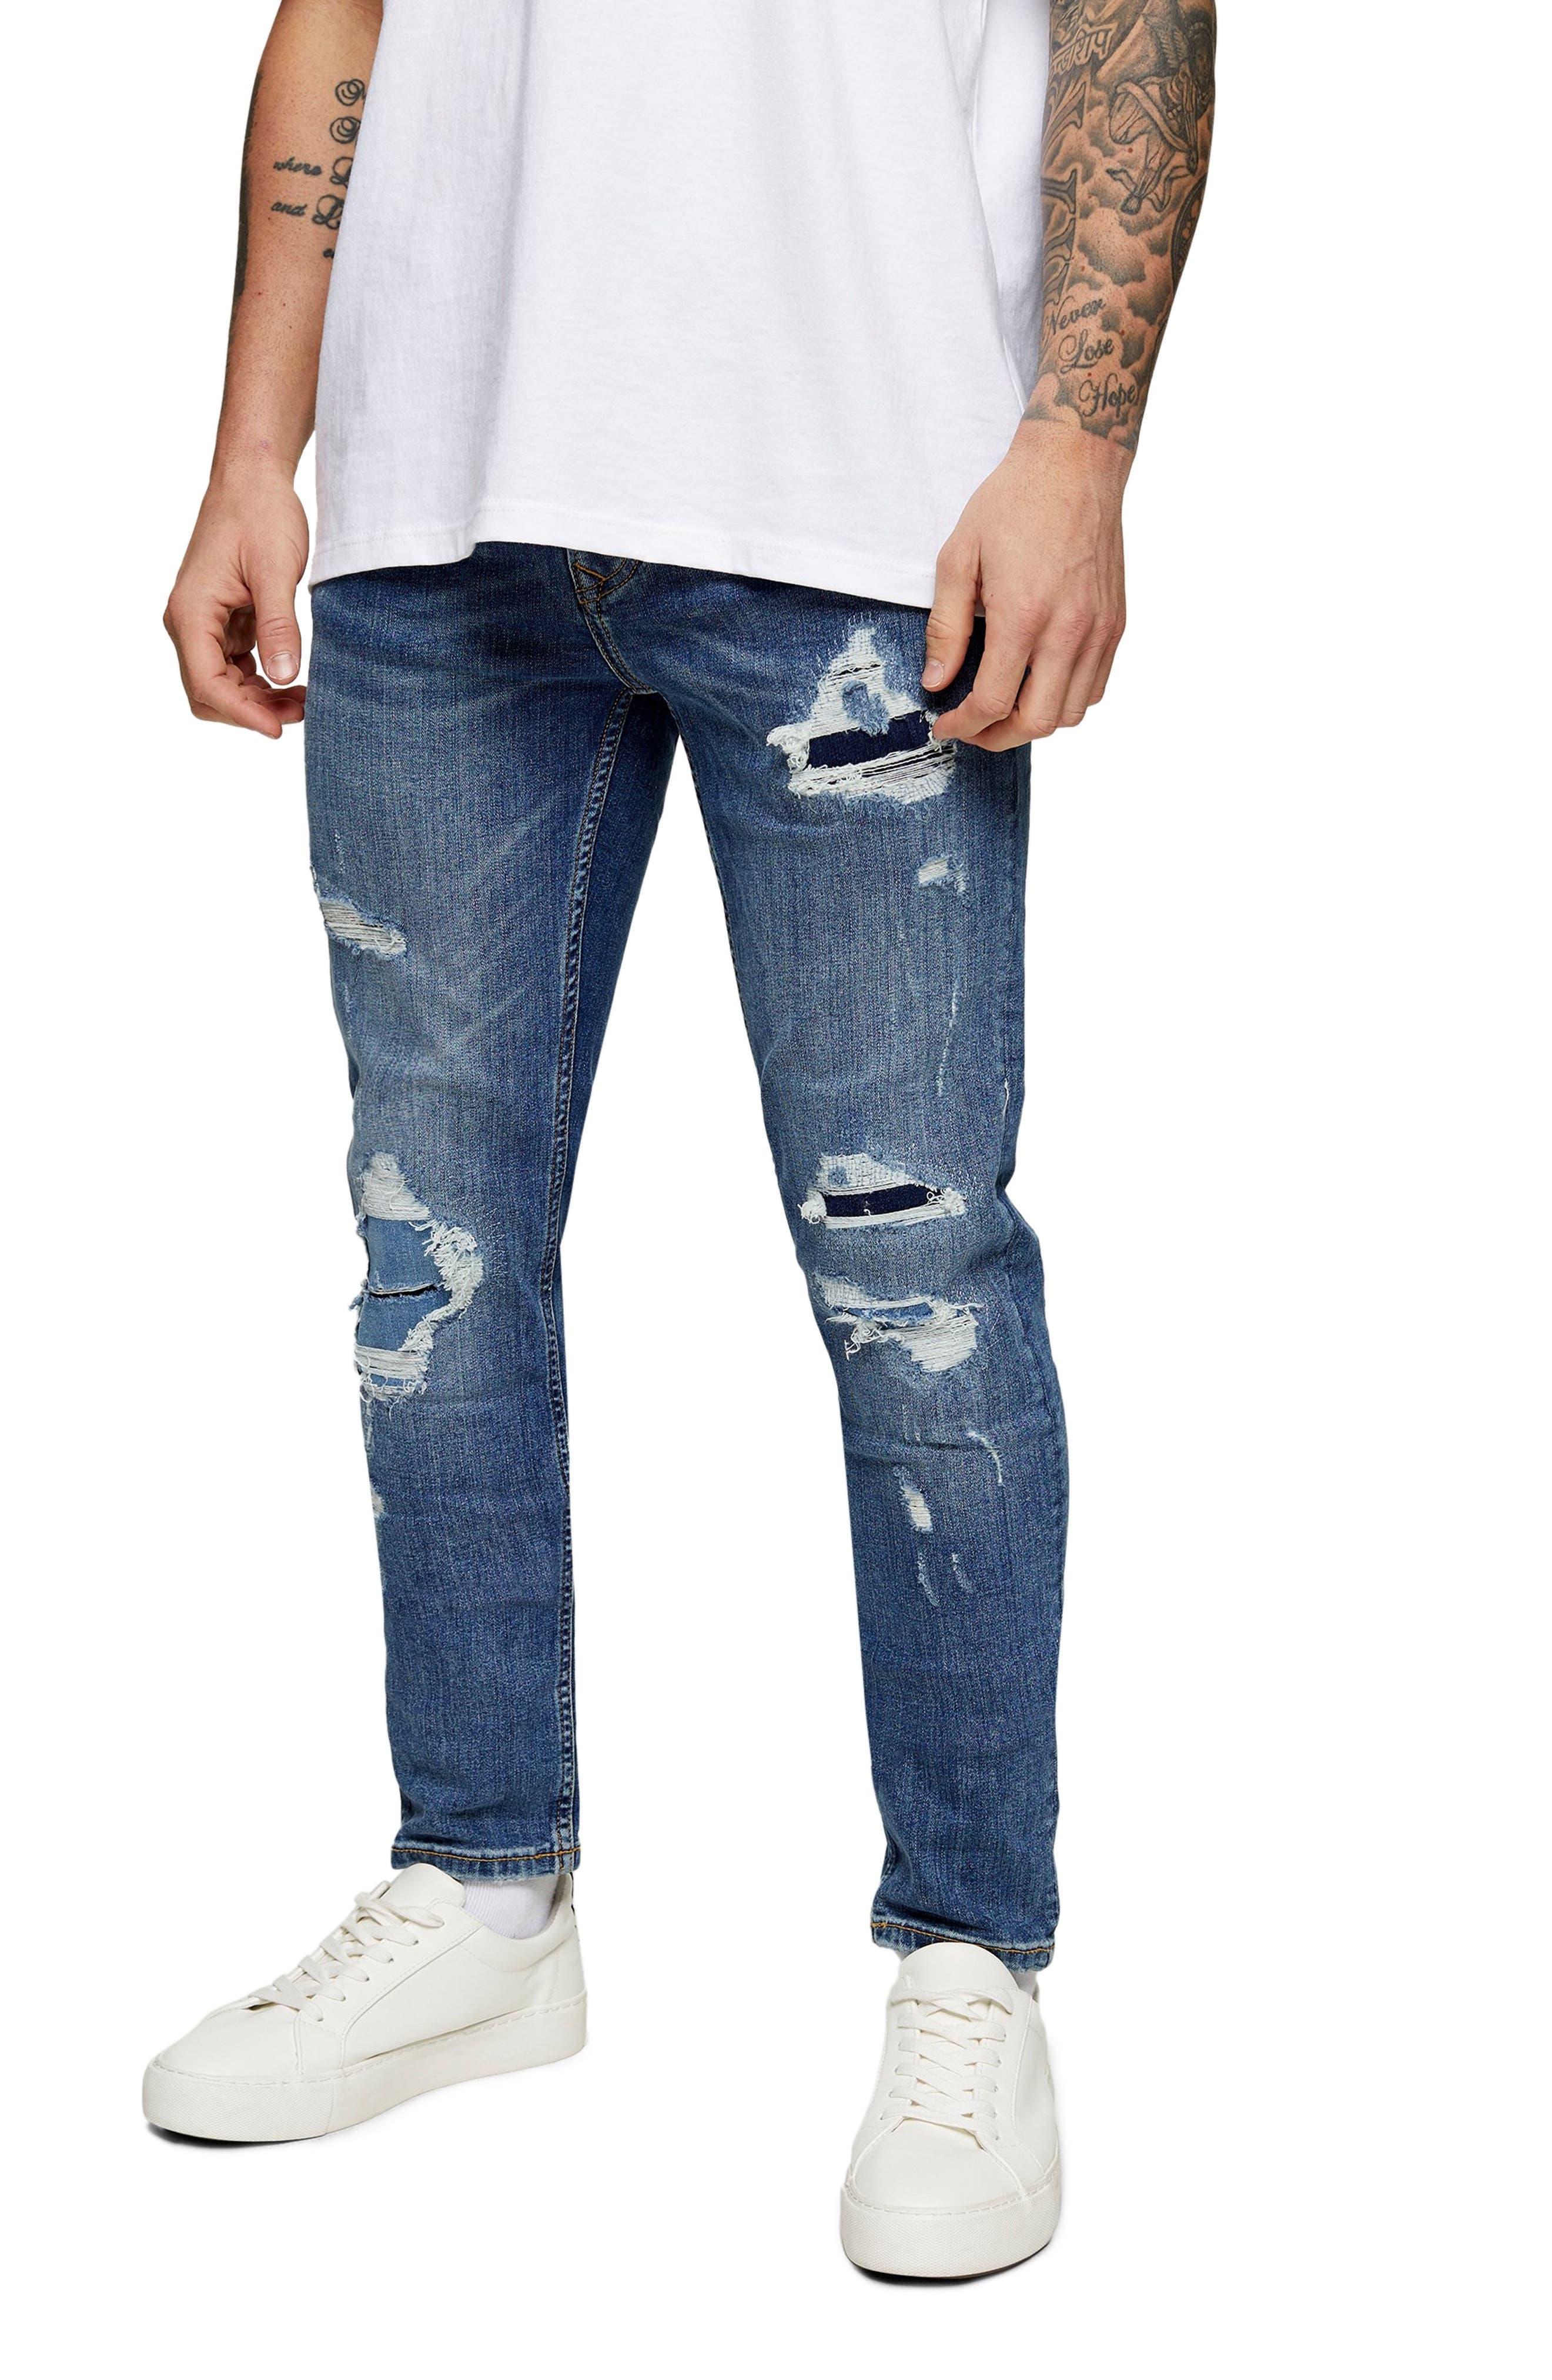 Mens Slim Fit Jeans Super Stretch Denim Pants Slim Skinny Casual Designer Jeans